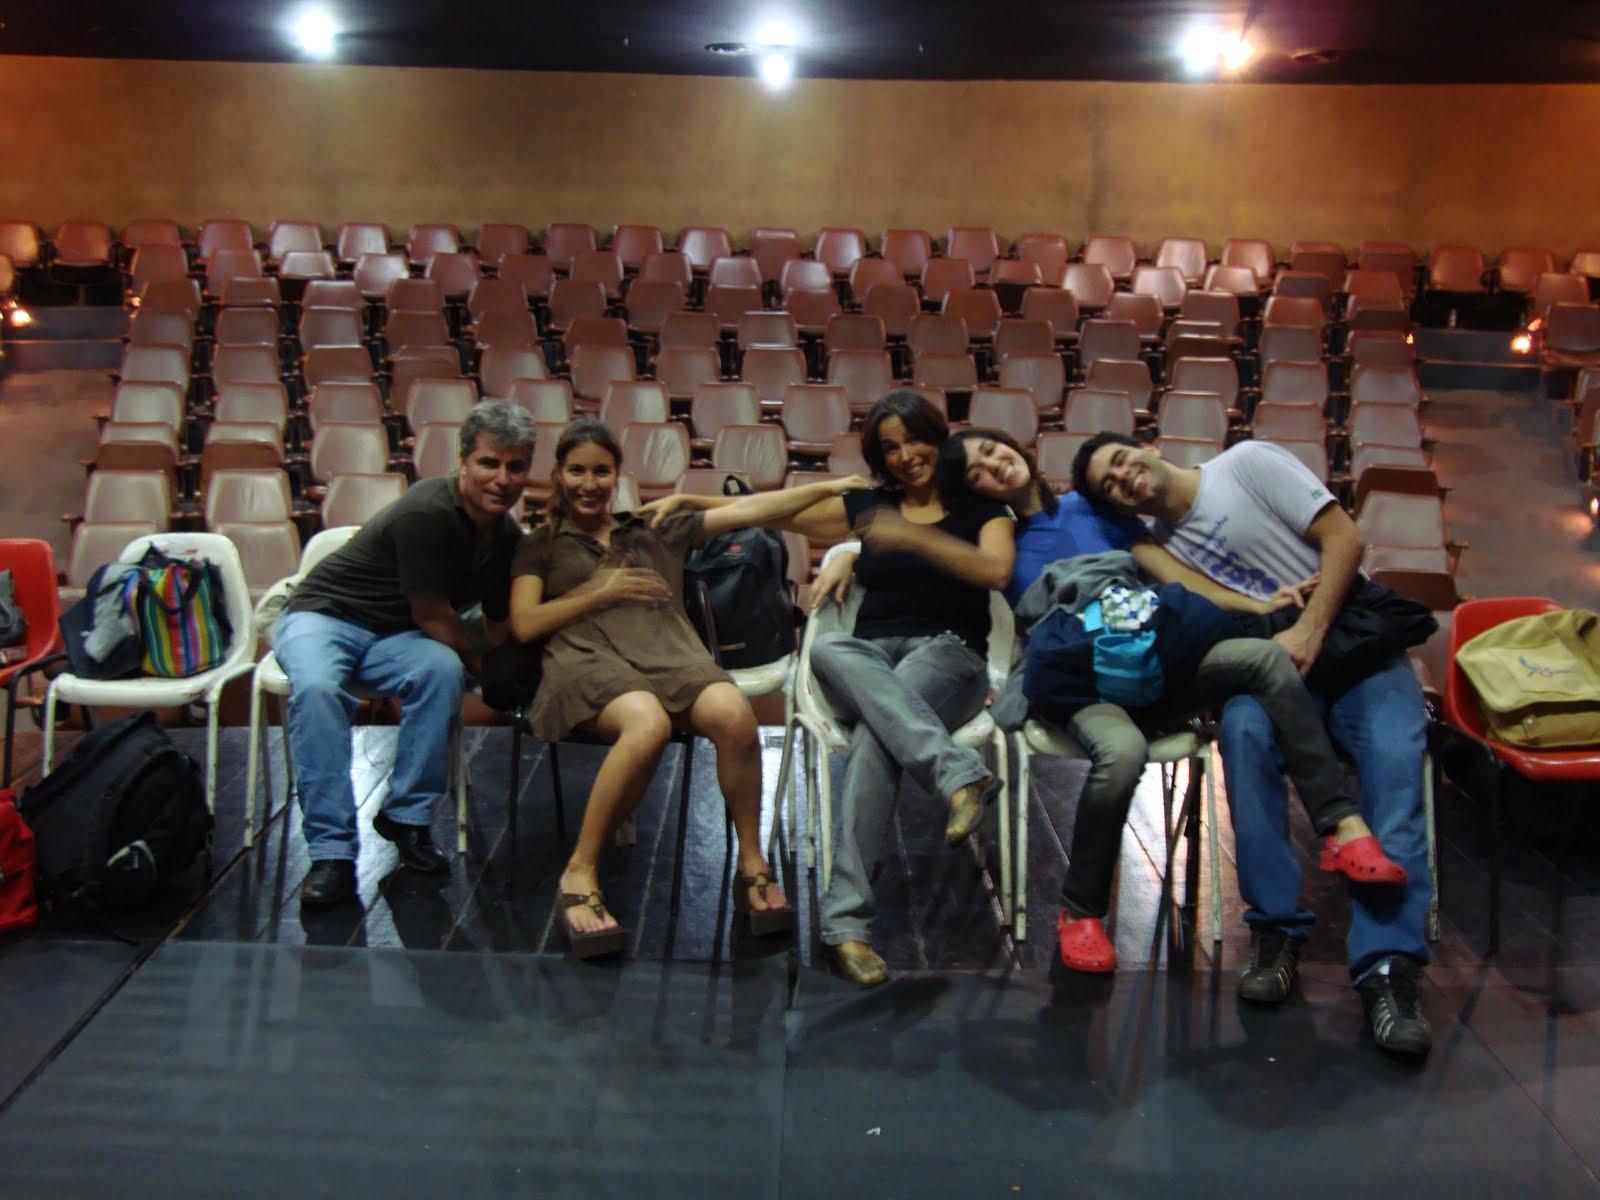 Temporada Autorretrato Dinâmico no Teatro Dulcina